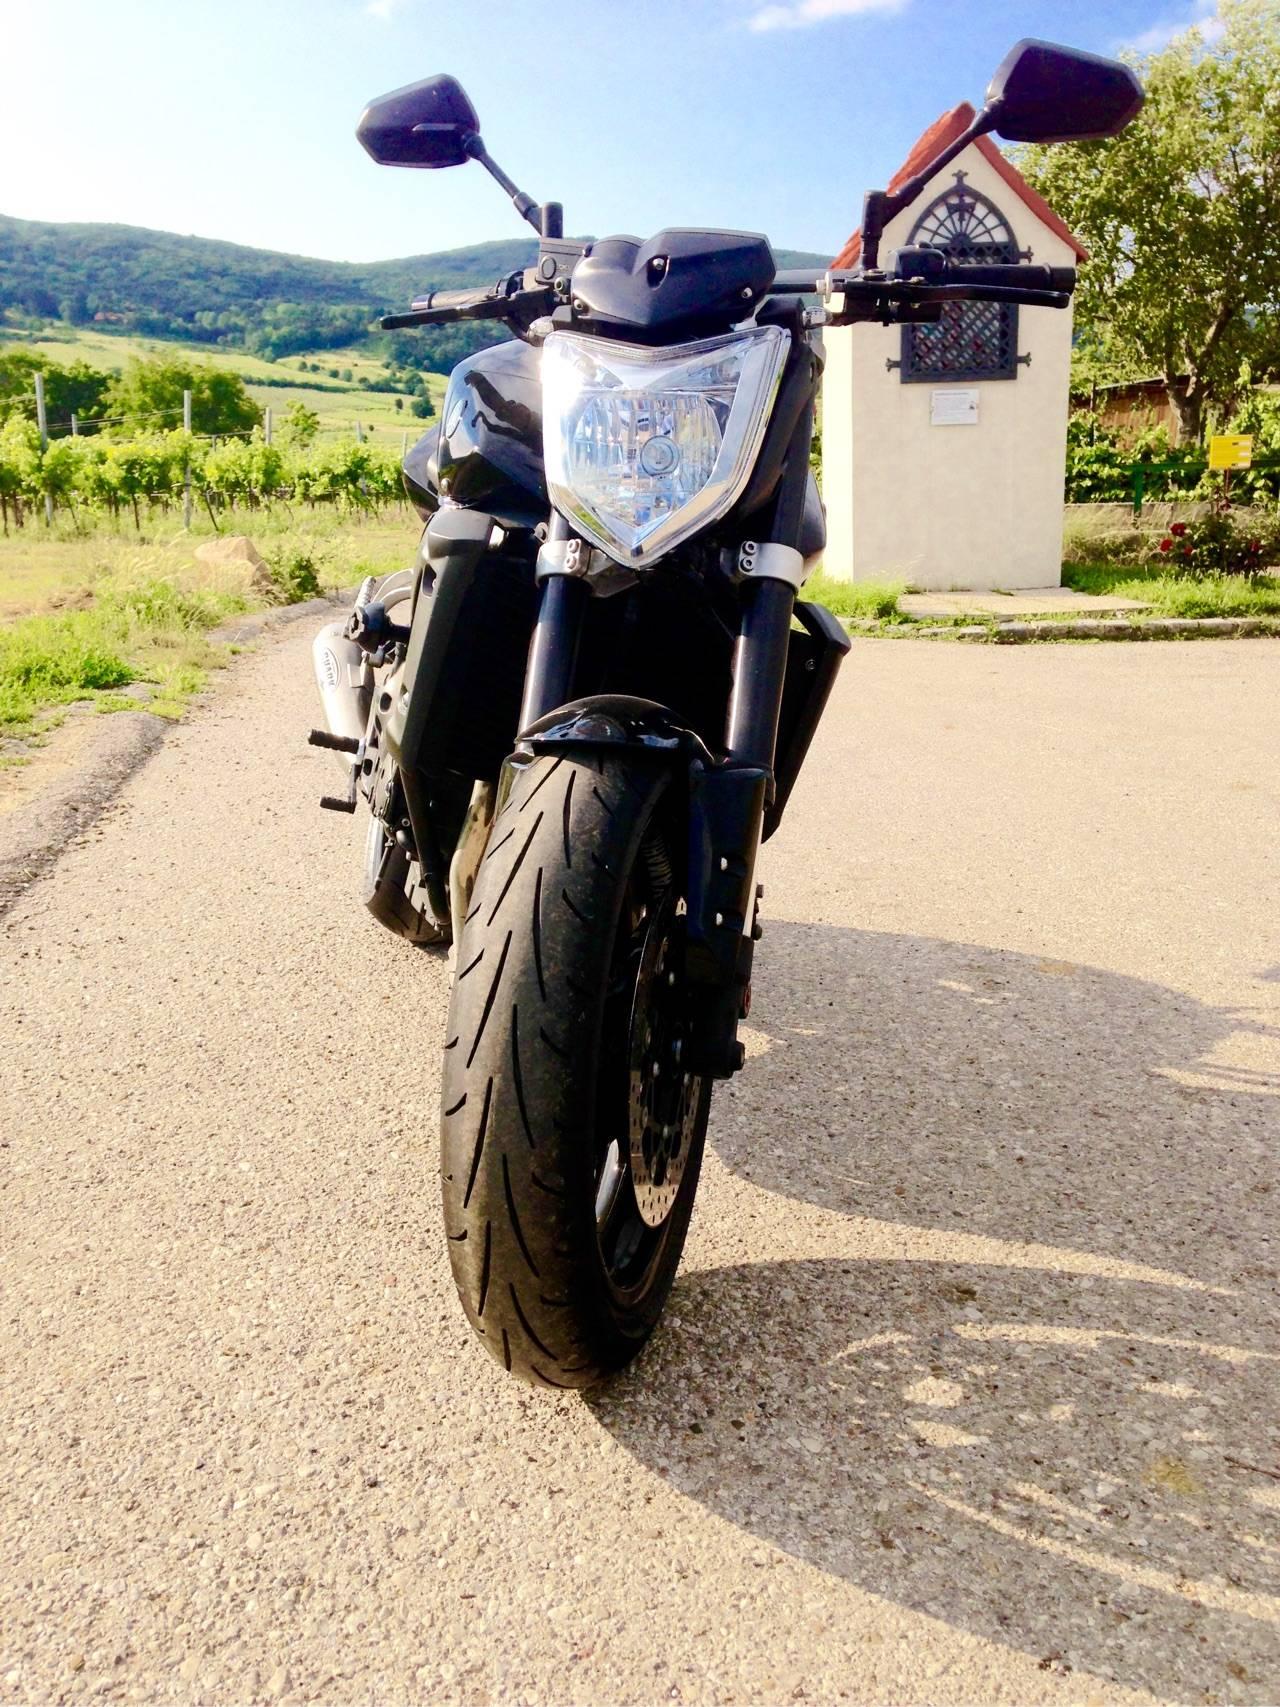 Te Koop: YAMAHA FZ8-N ABS 50th Anniversary Wor - BikeNet